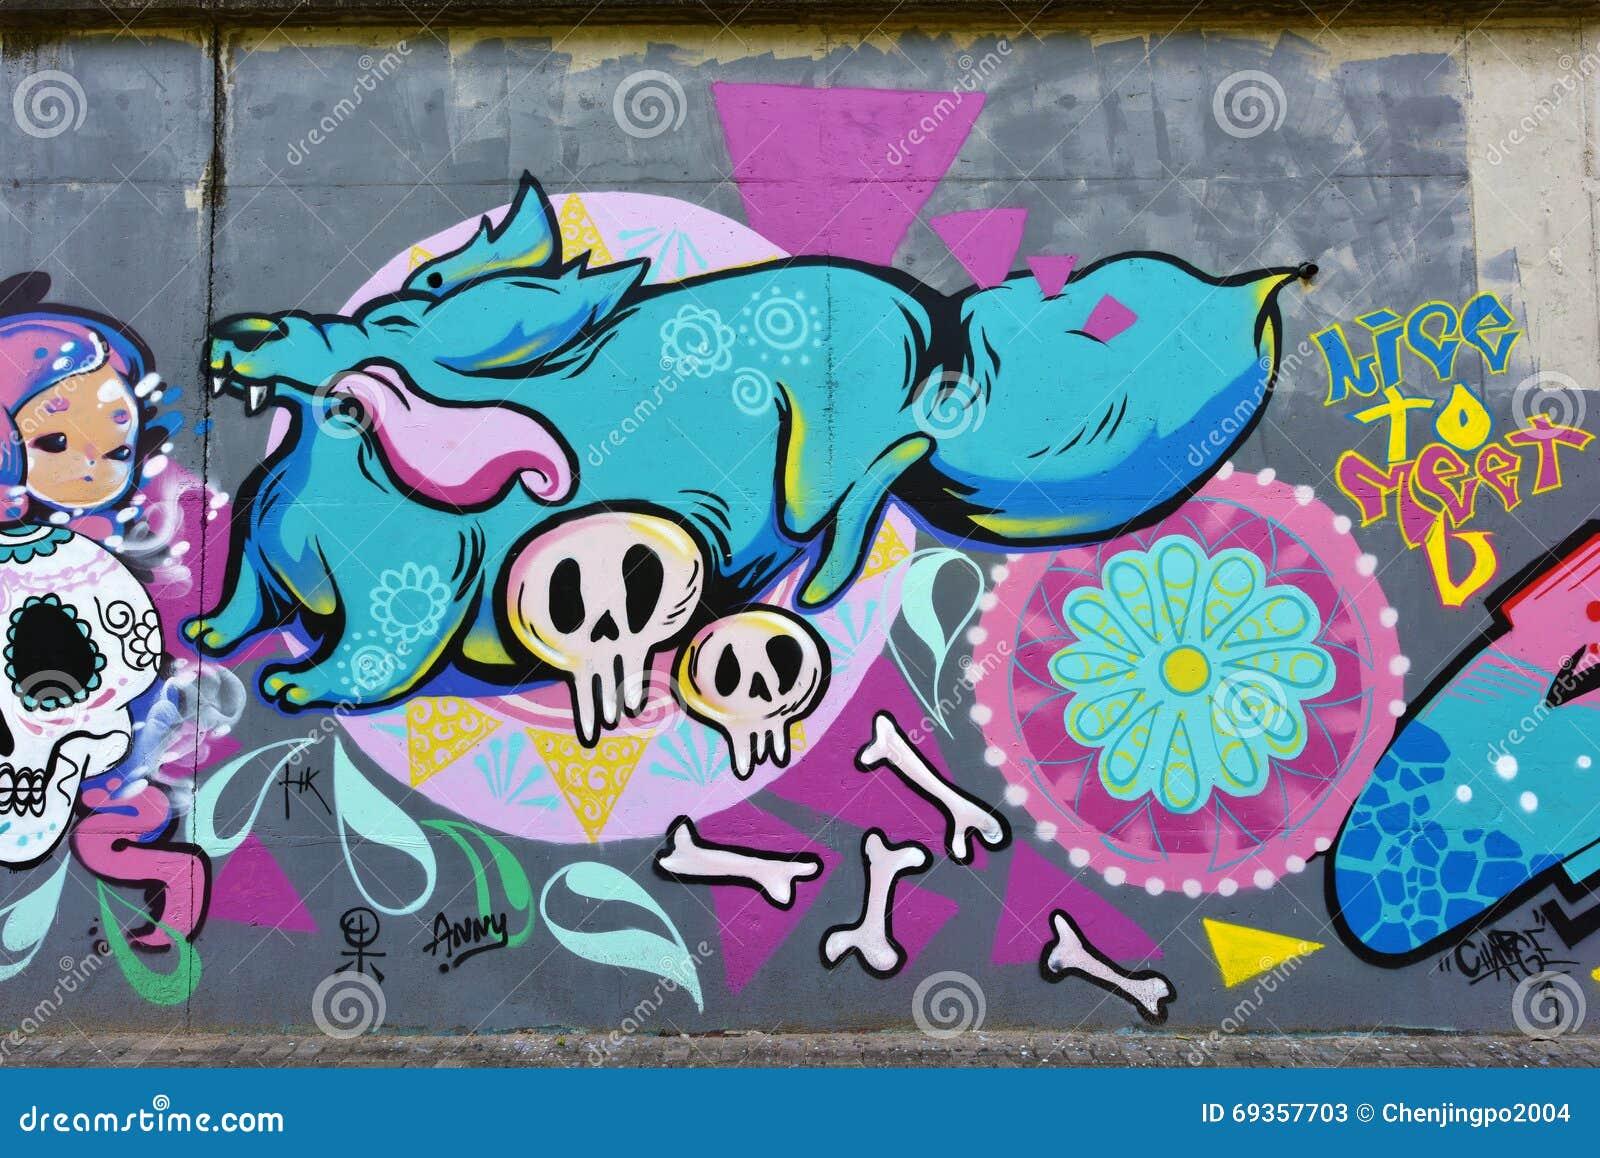 Cement Wall Graffiti : The city graffiti on cement wall editorial stock photo